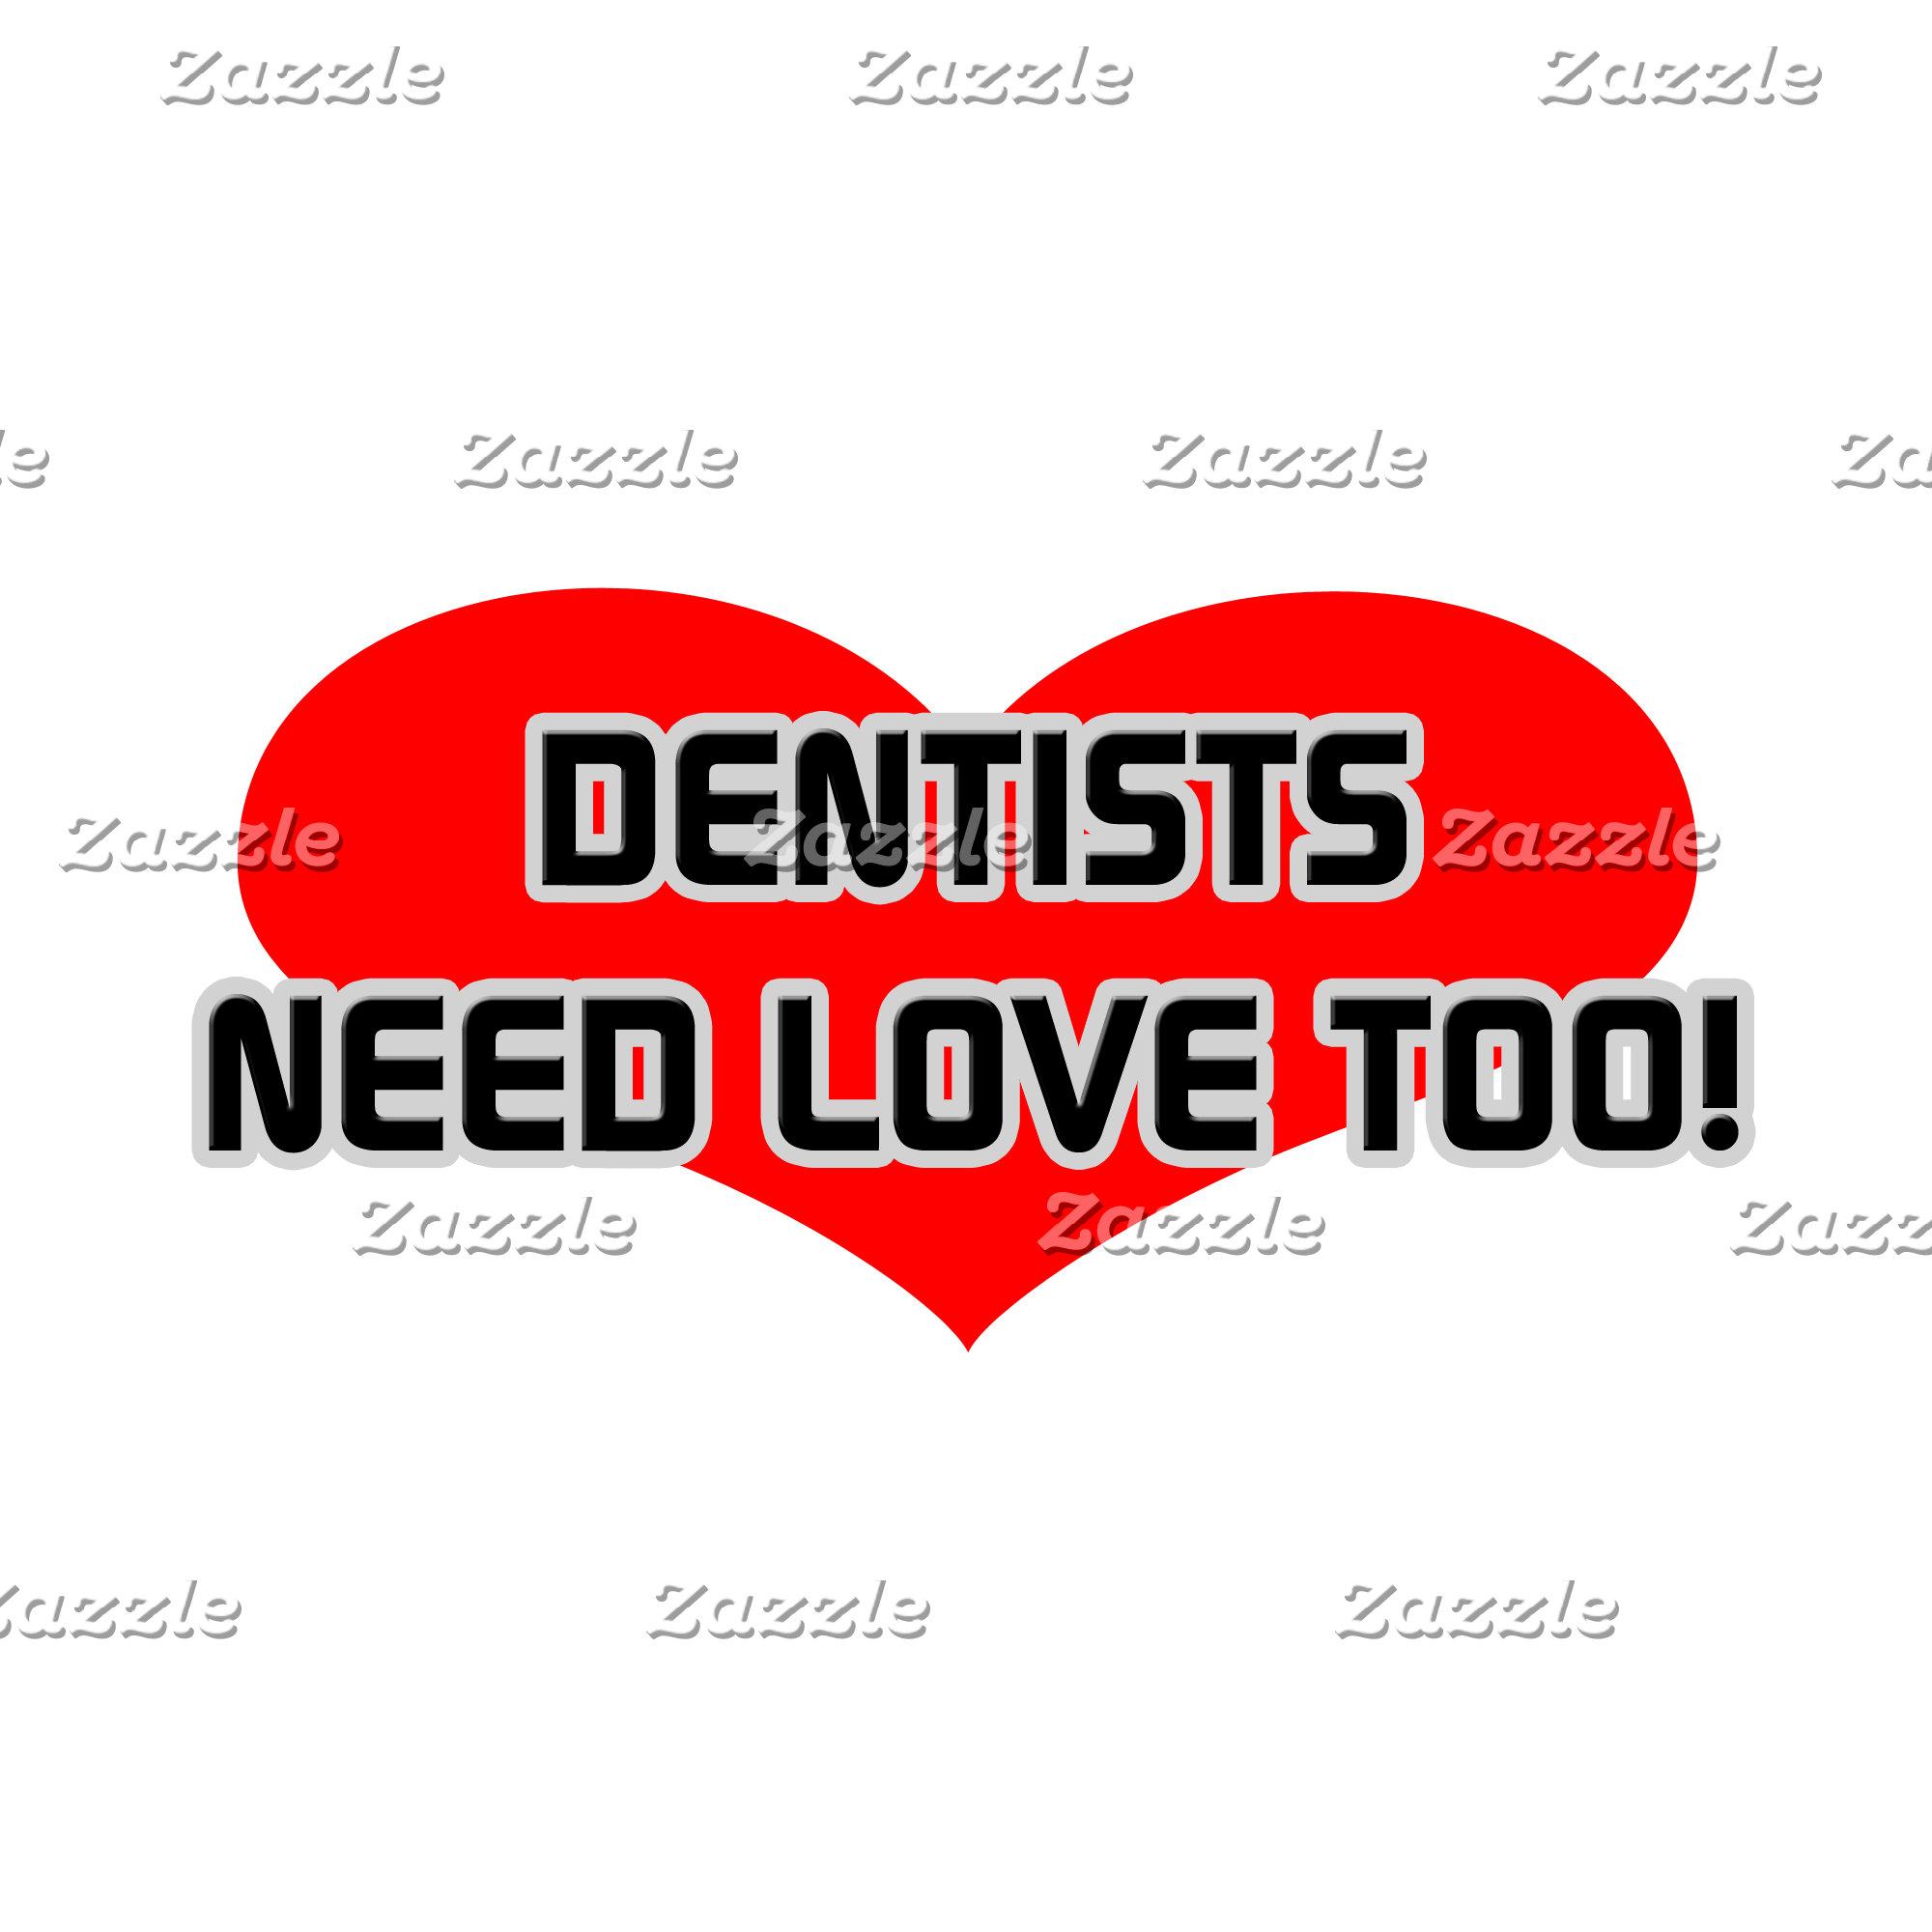 Dentists Need Love Too